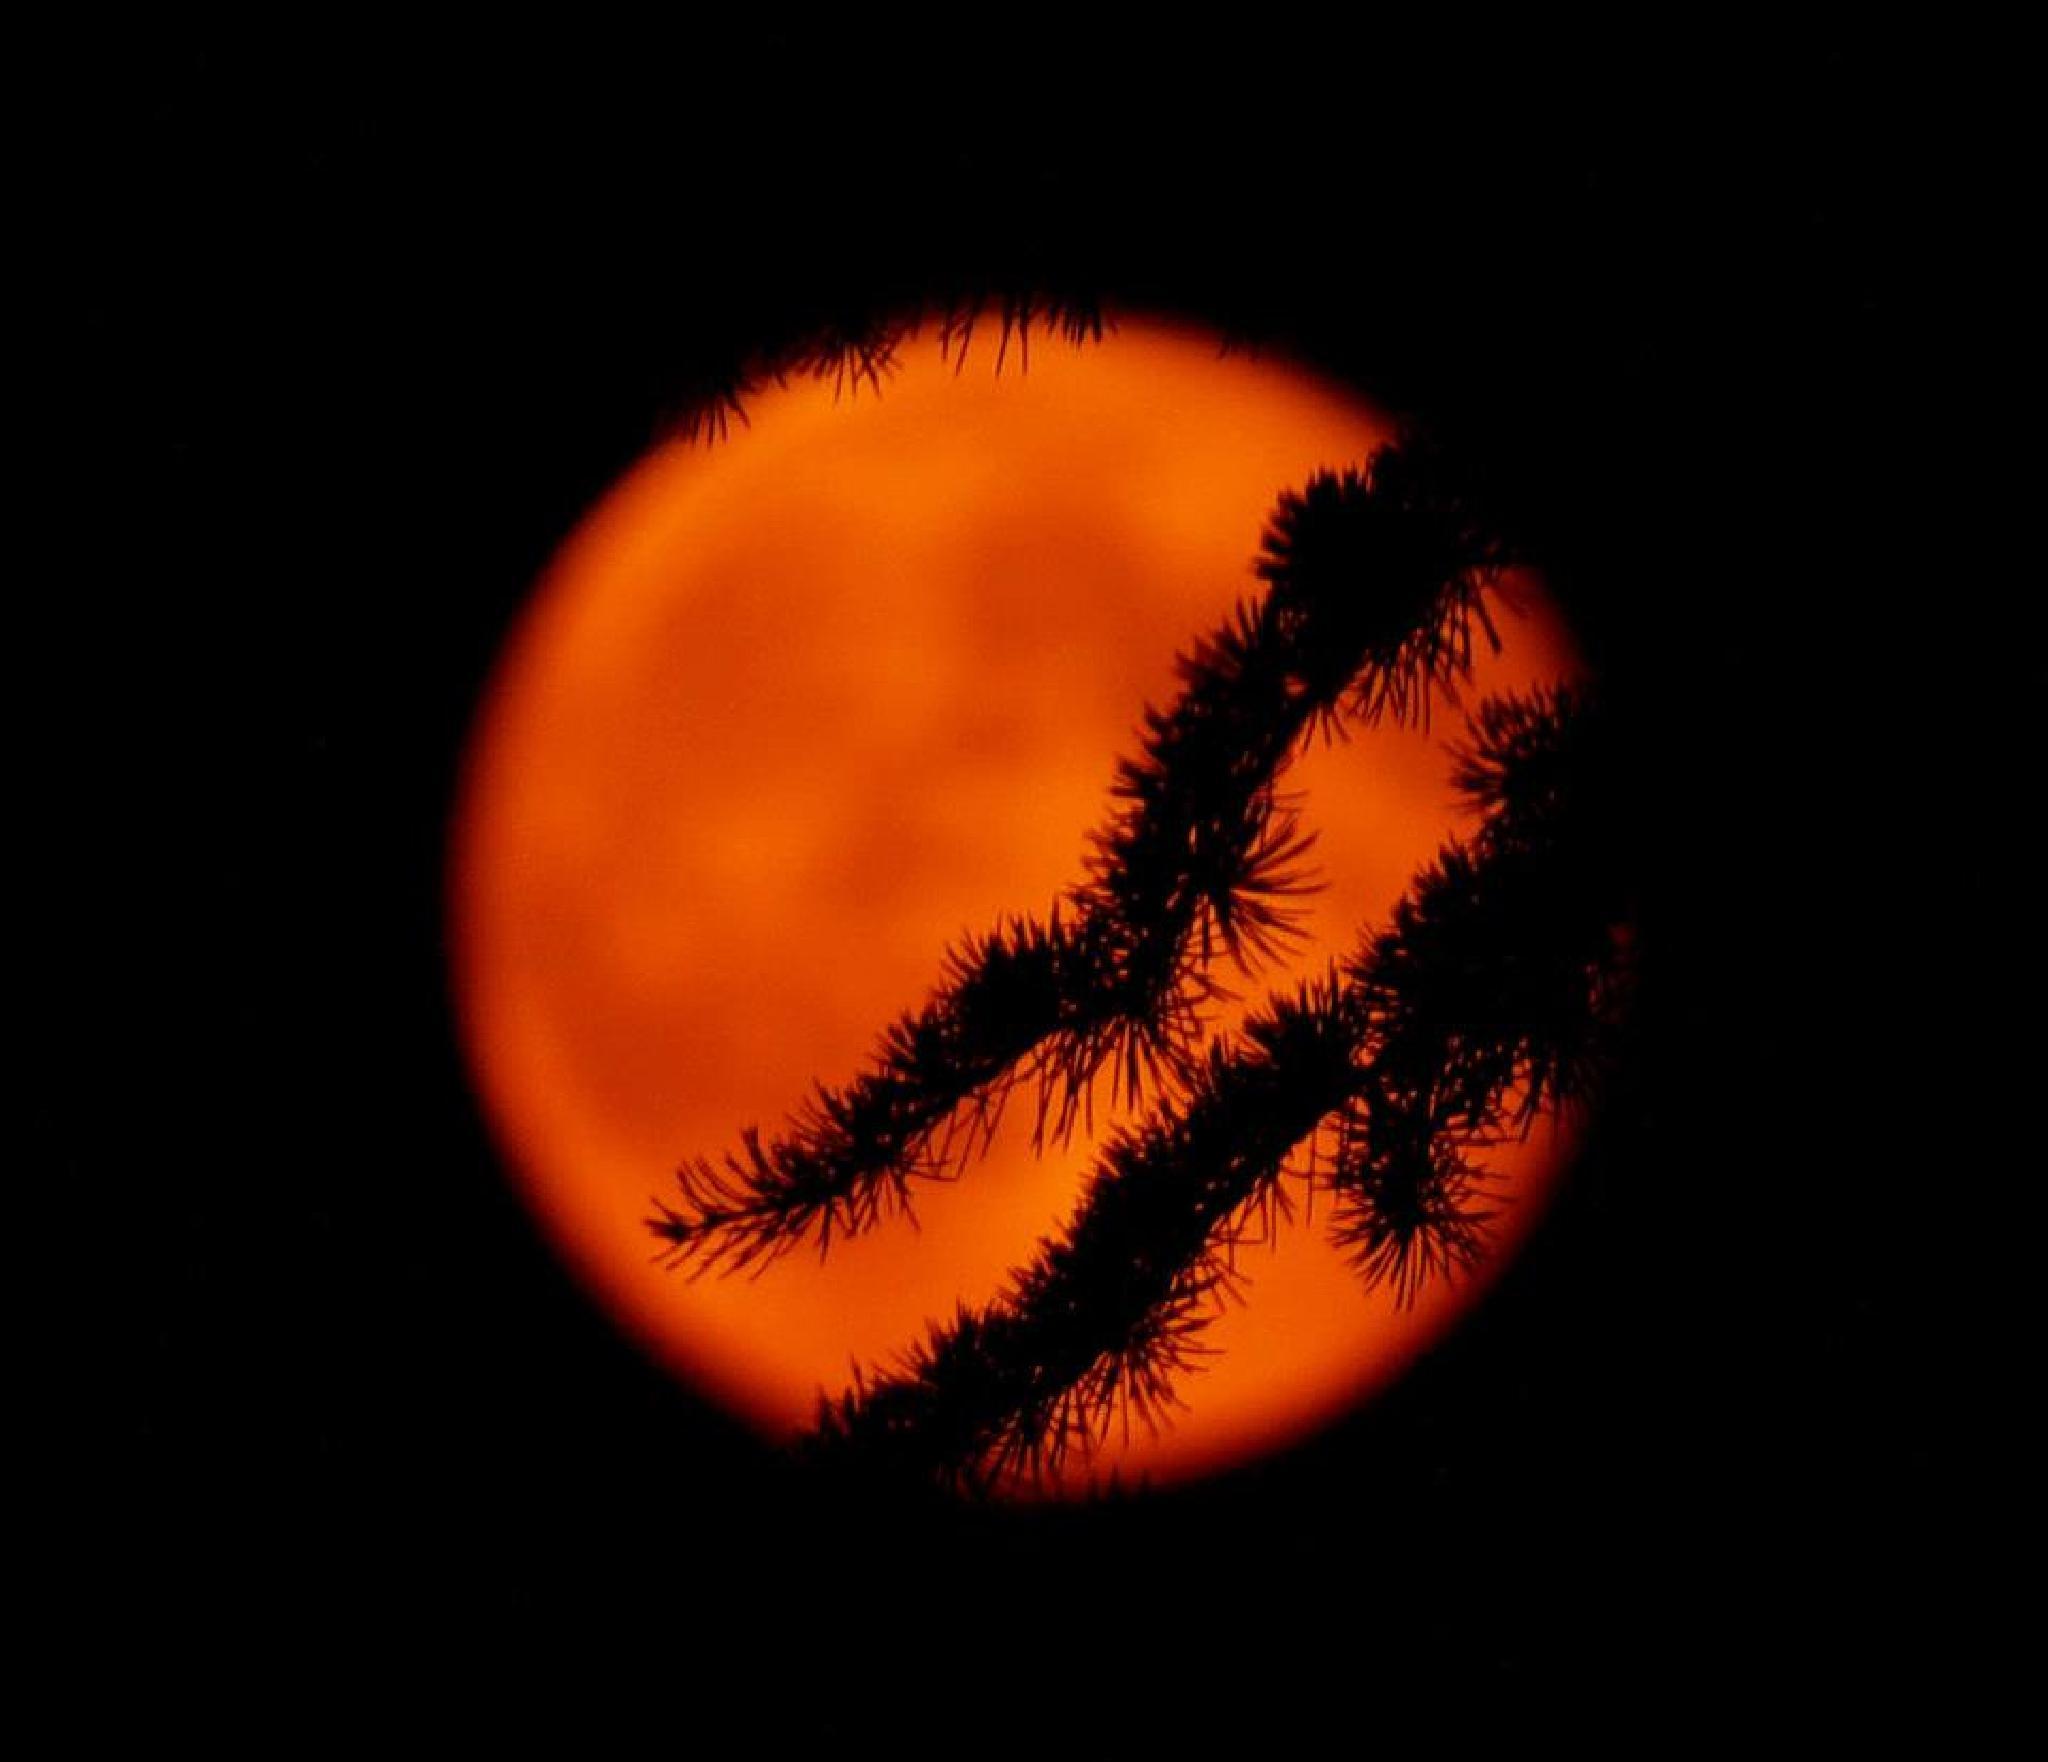 Red moon by Kenéz Imre